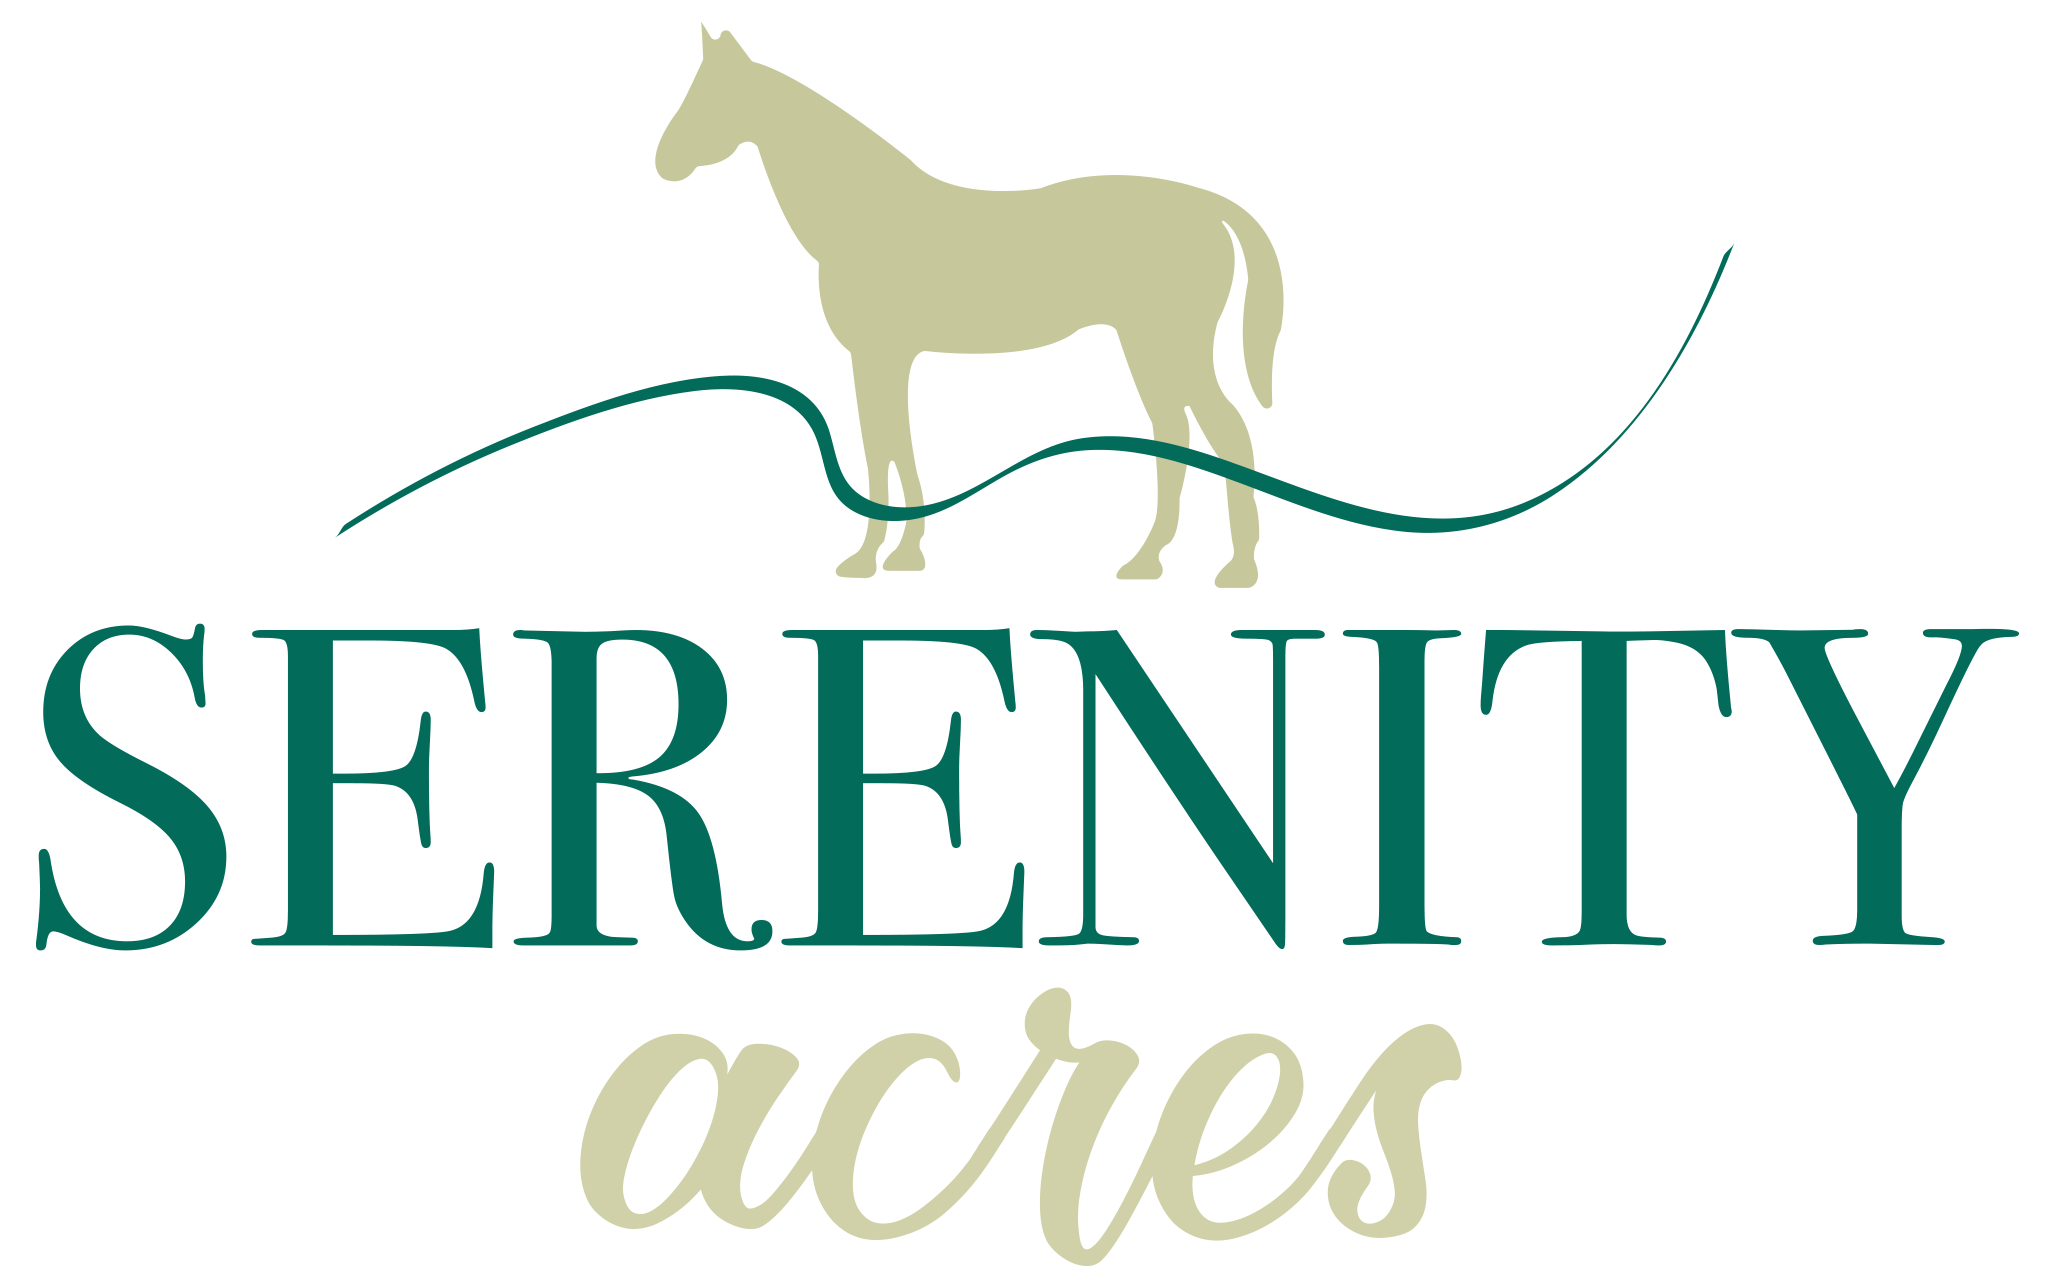 Serenity_Acres_logo_FINAL.png